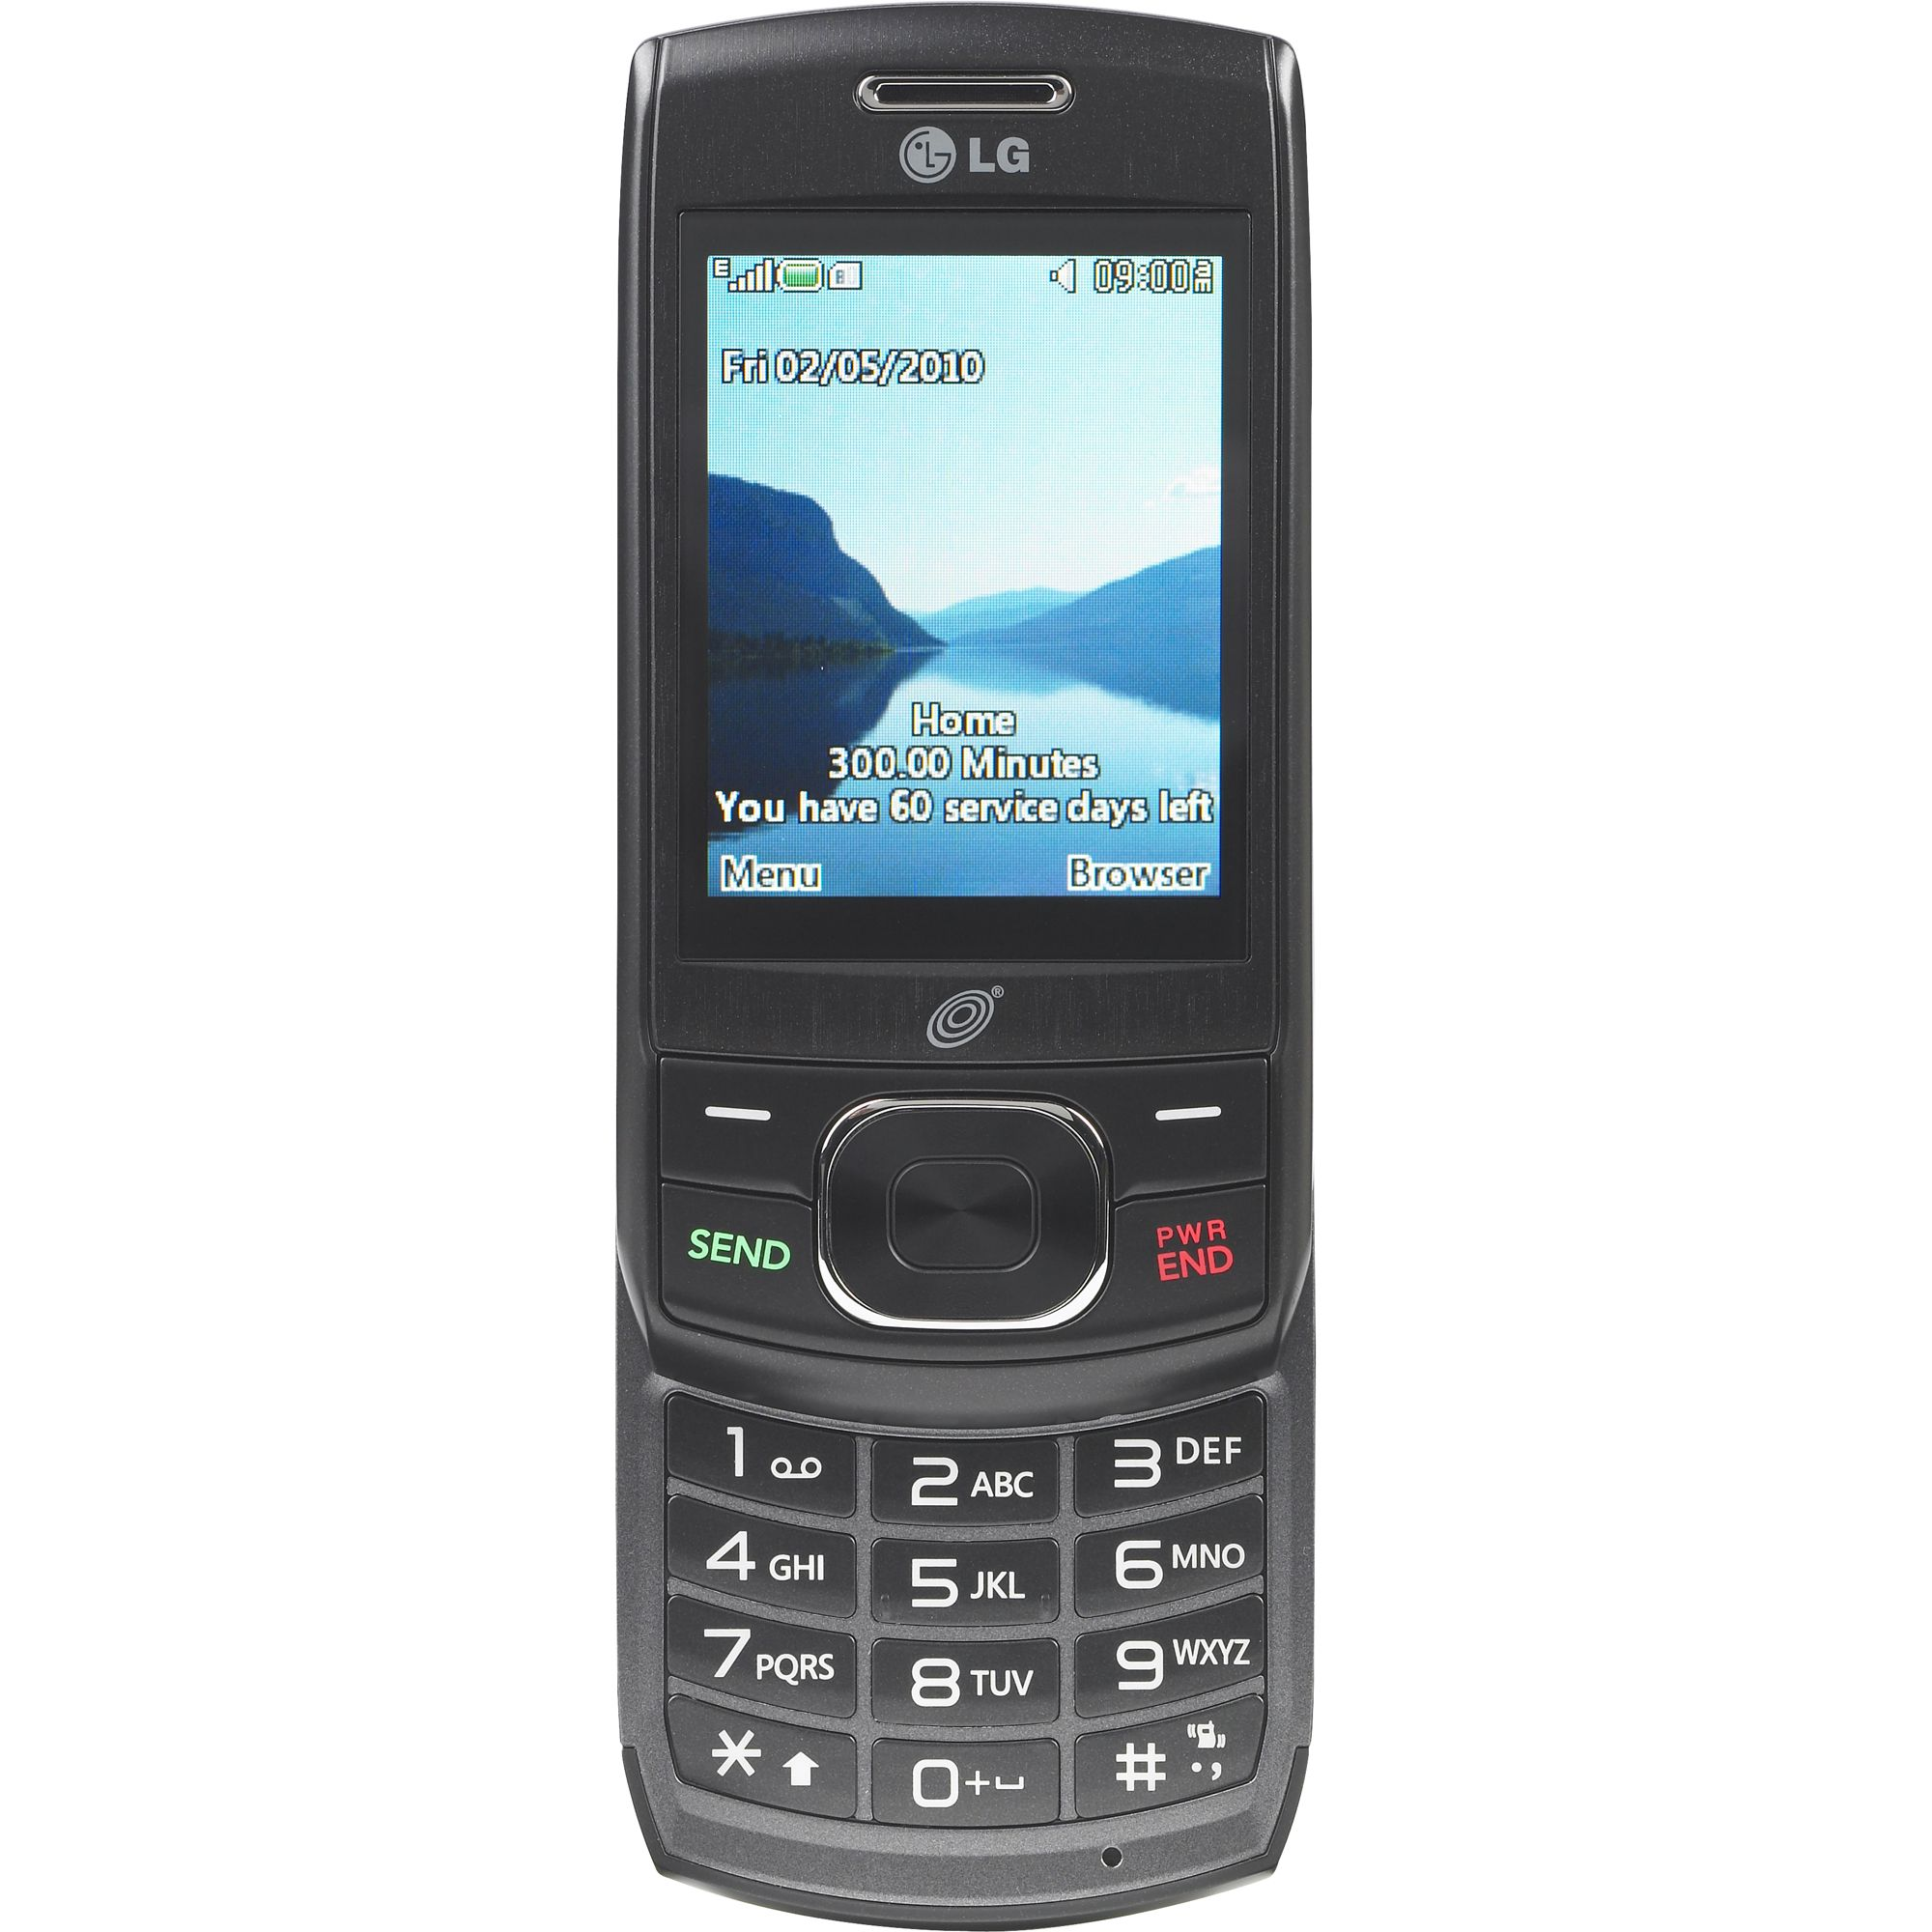 Net10 Ntlg620gp4-n3 Lg 620g Pre-paid Cell Phone